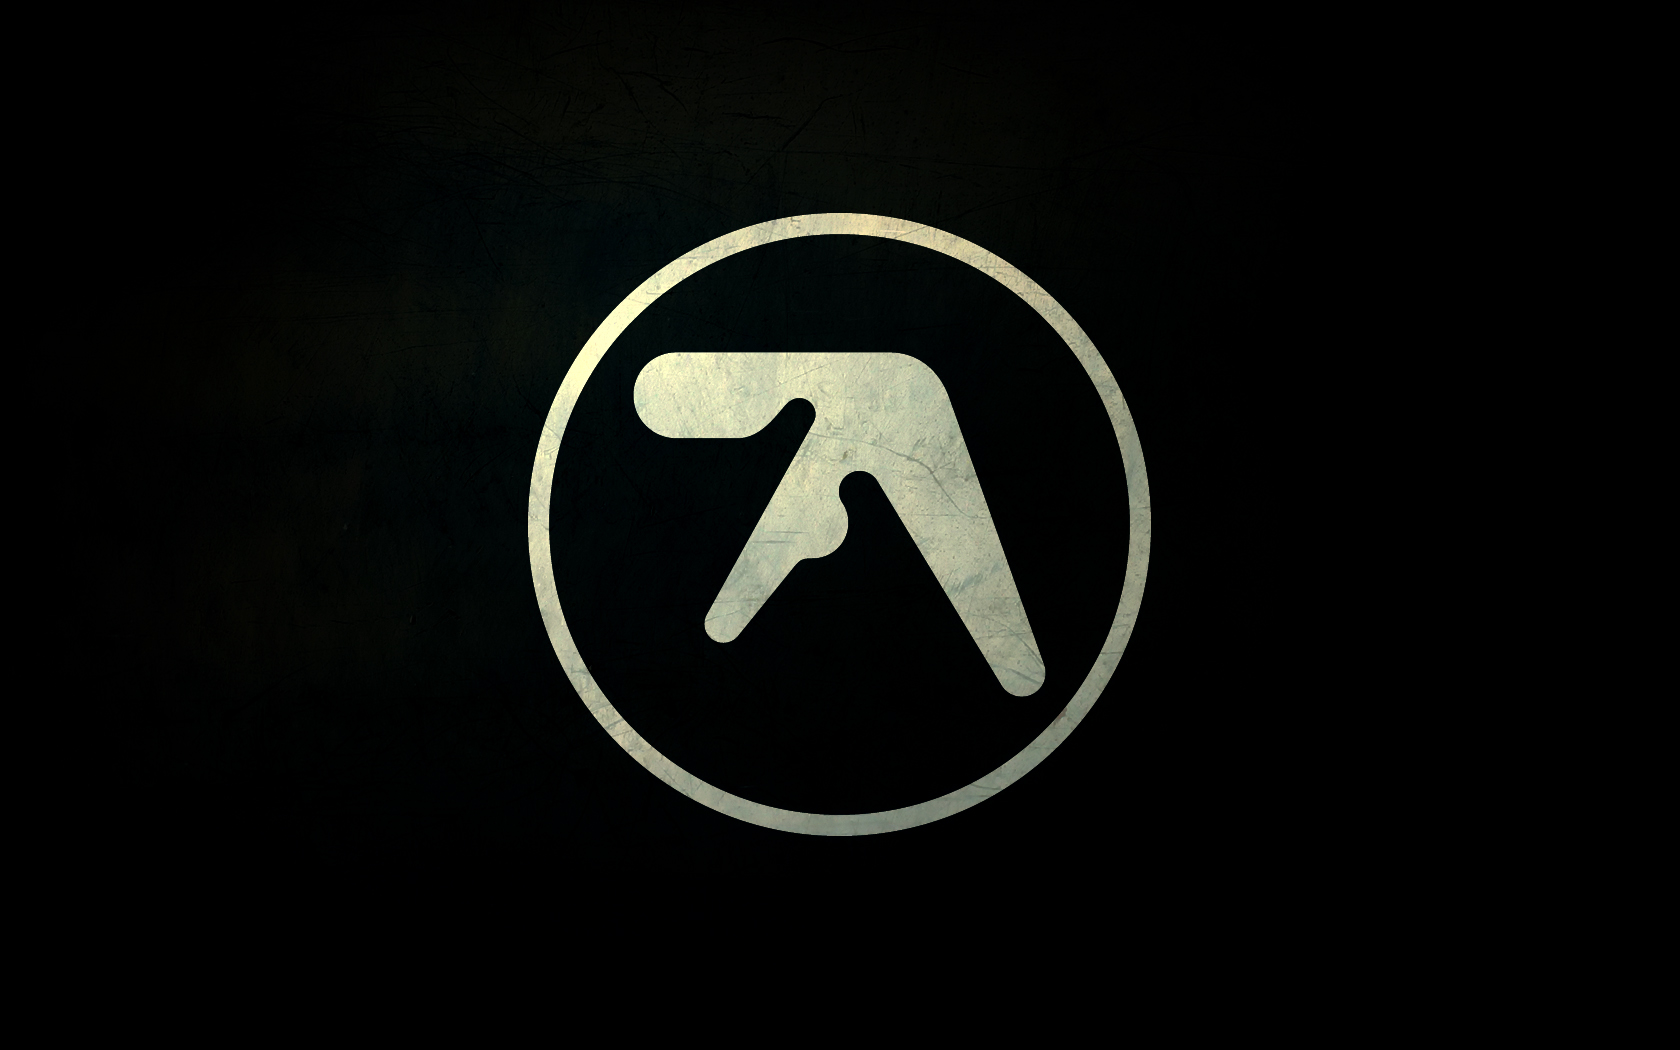 1680x1050 Aphex Twin Logos